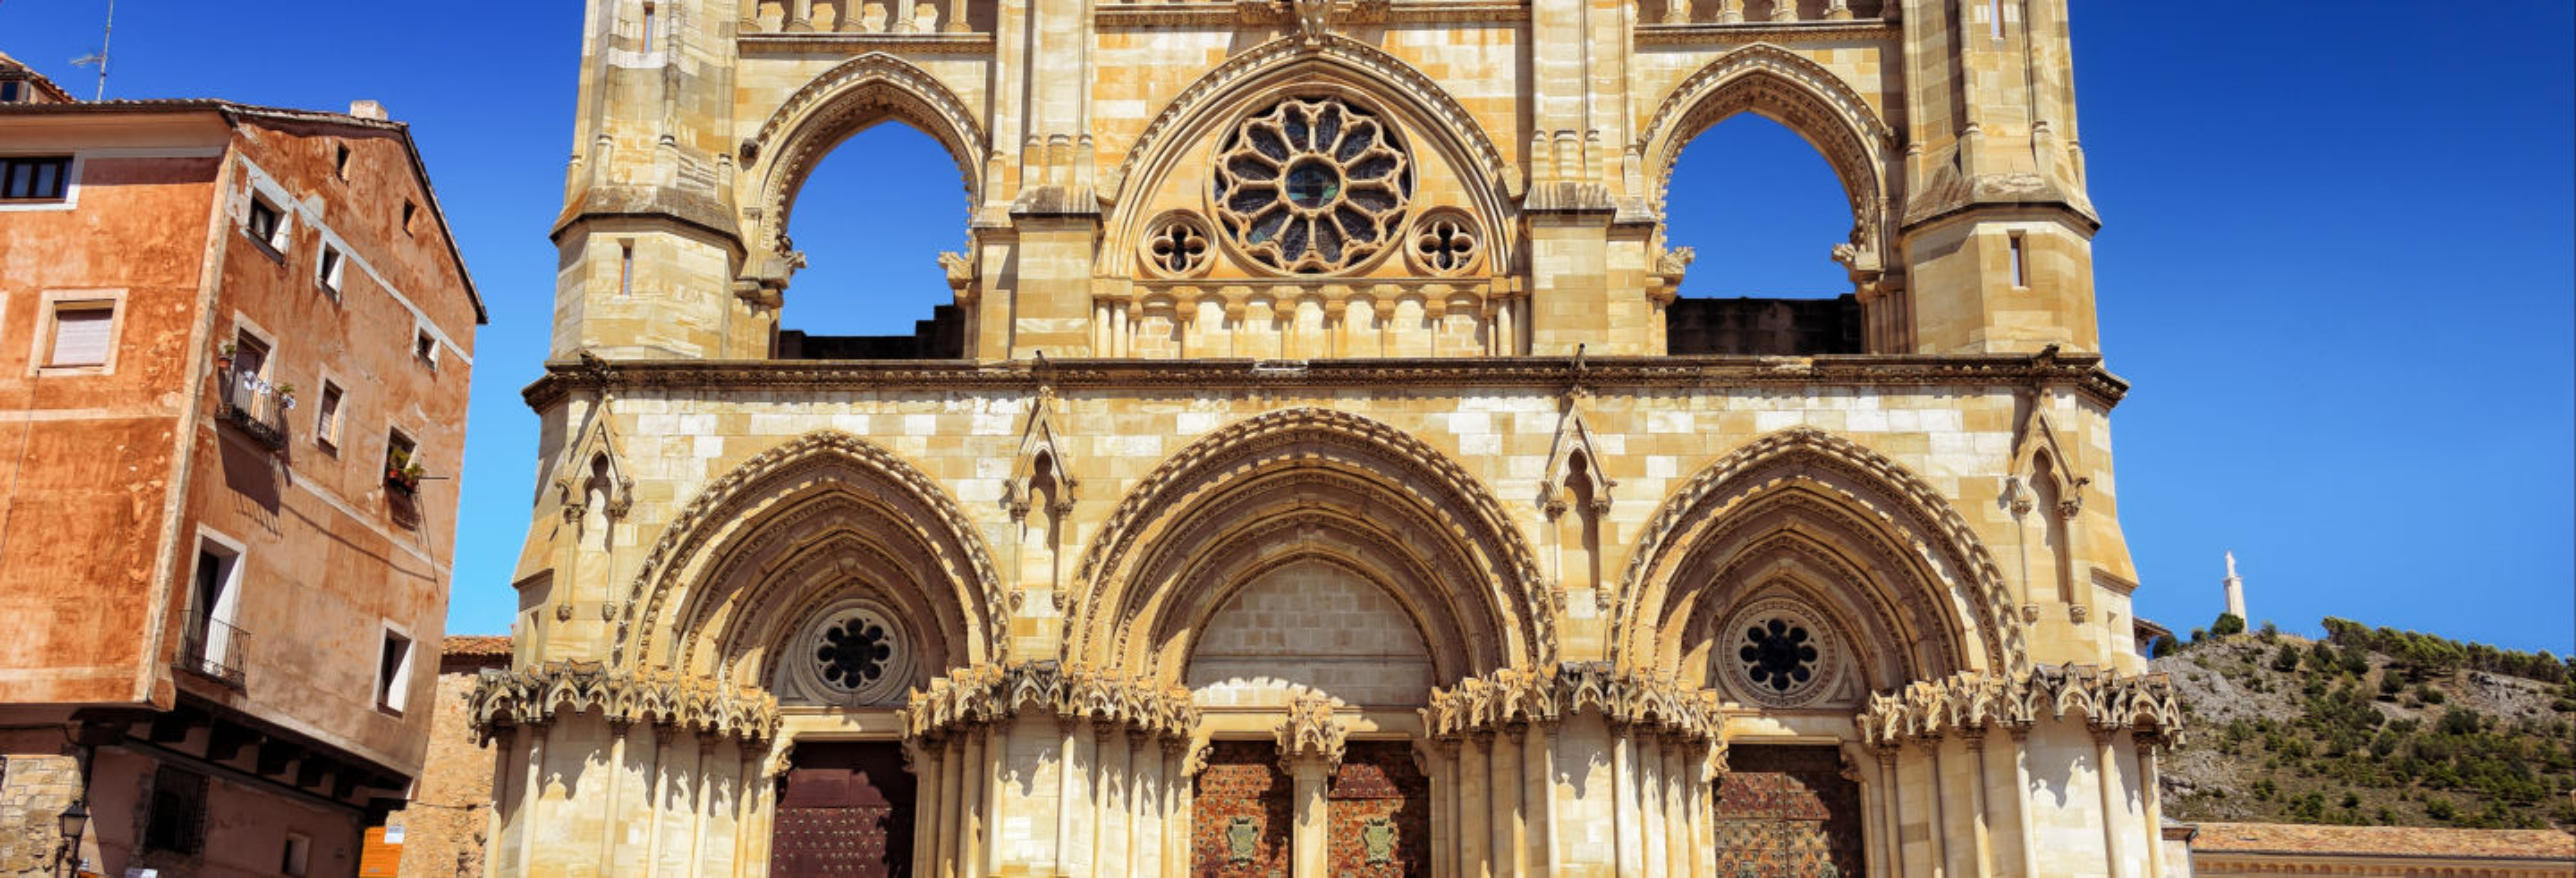 Visita guiada pela catedral de Cuenca